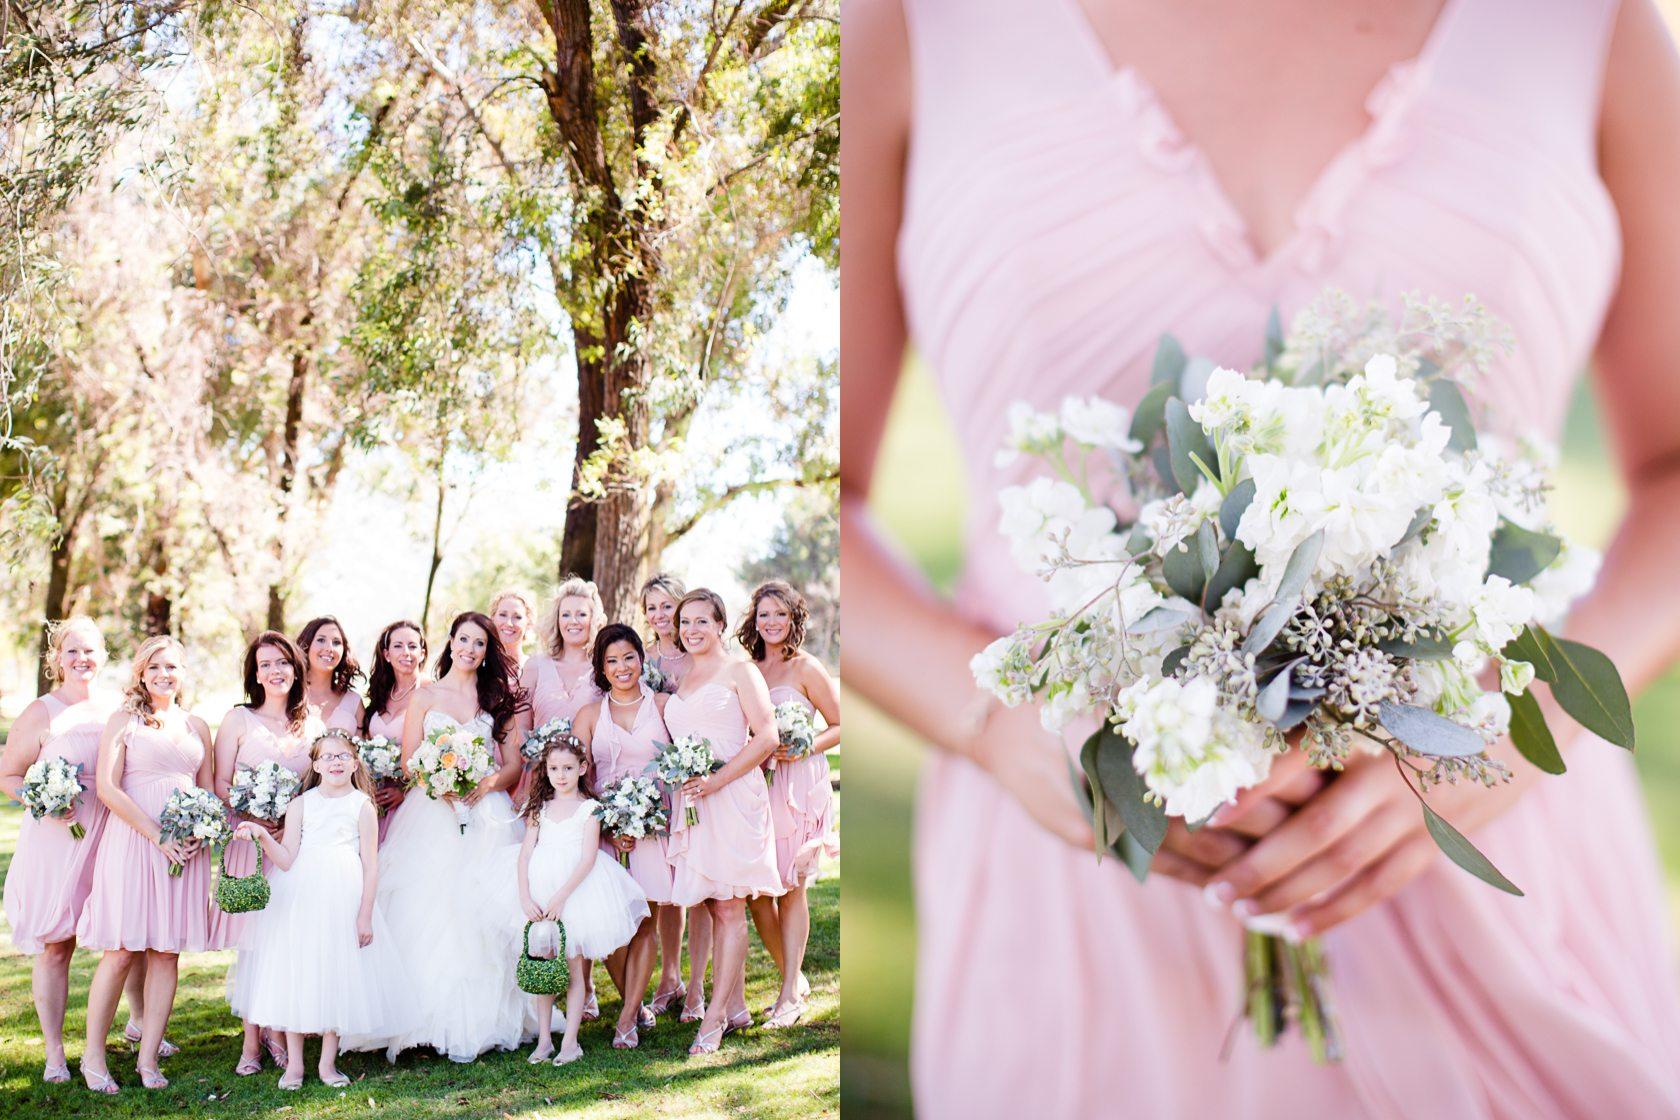 Temecula_Creek_Inn_Wedding_038.jpg